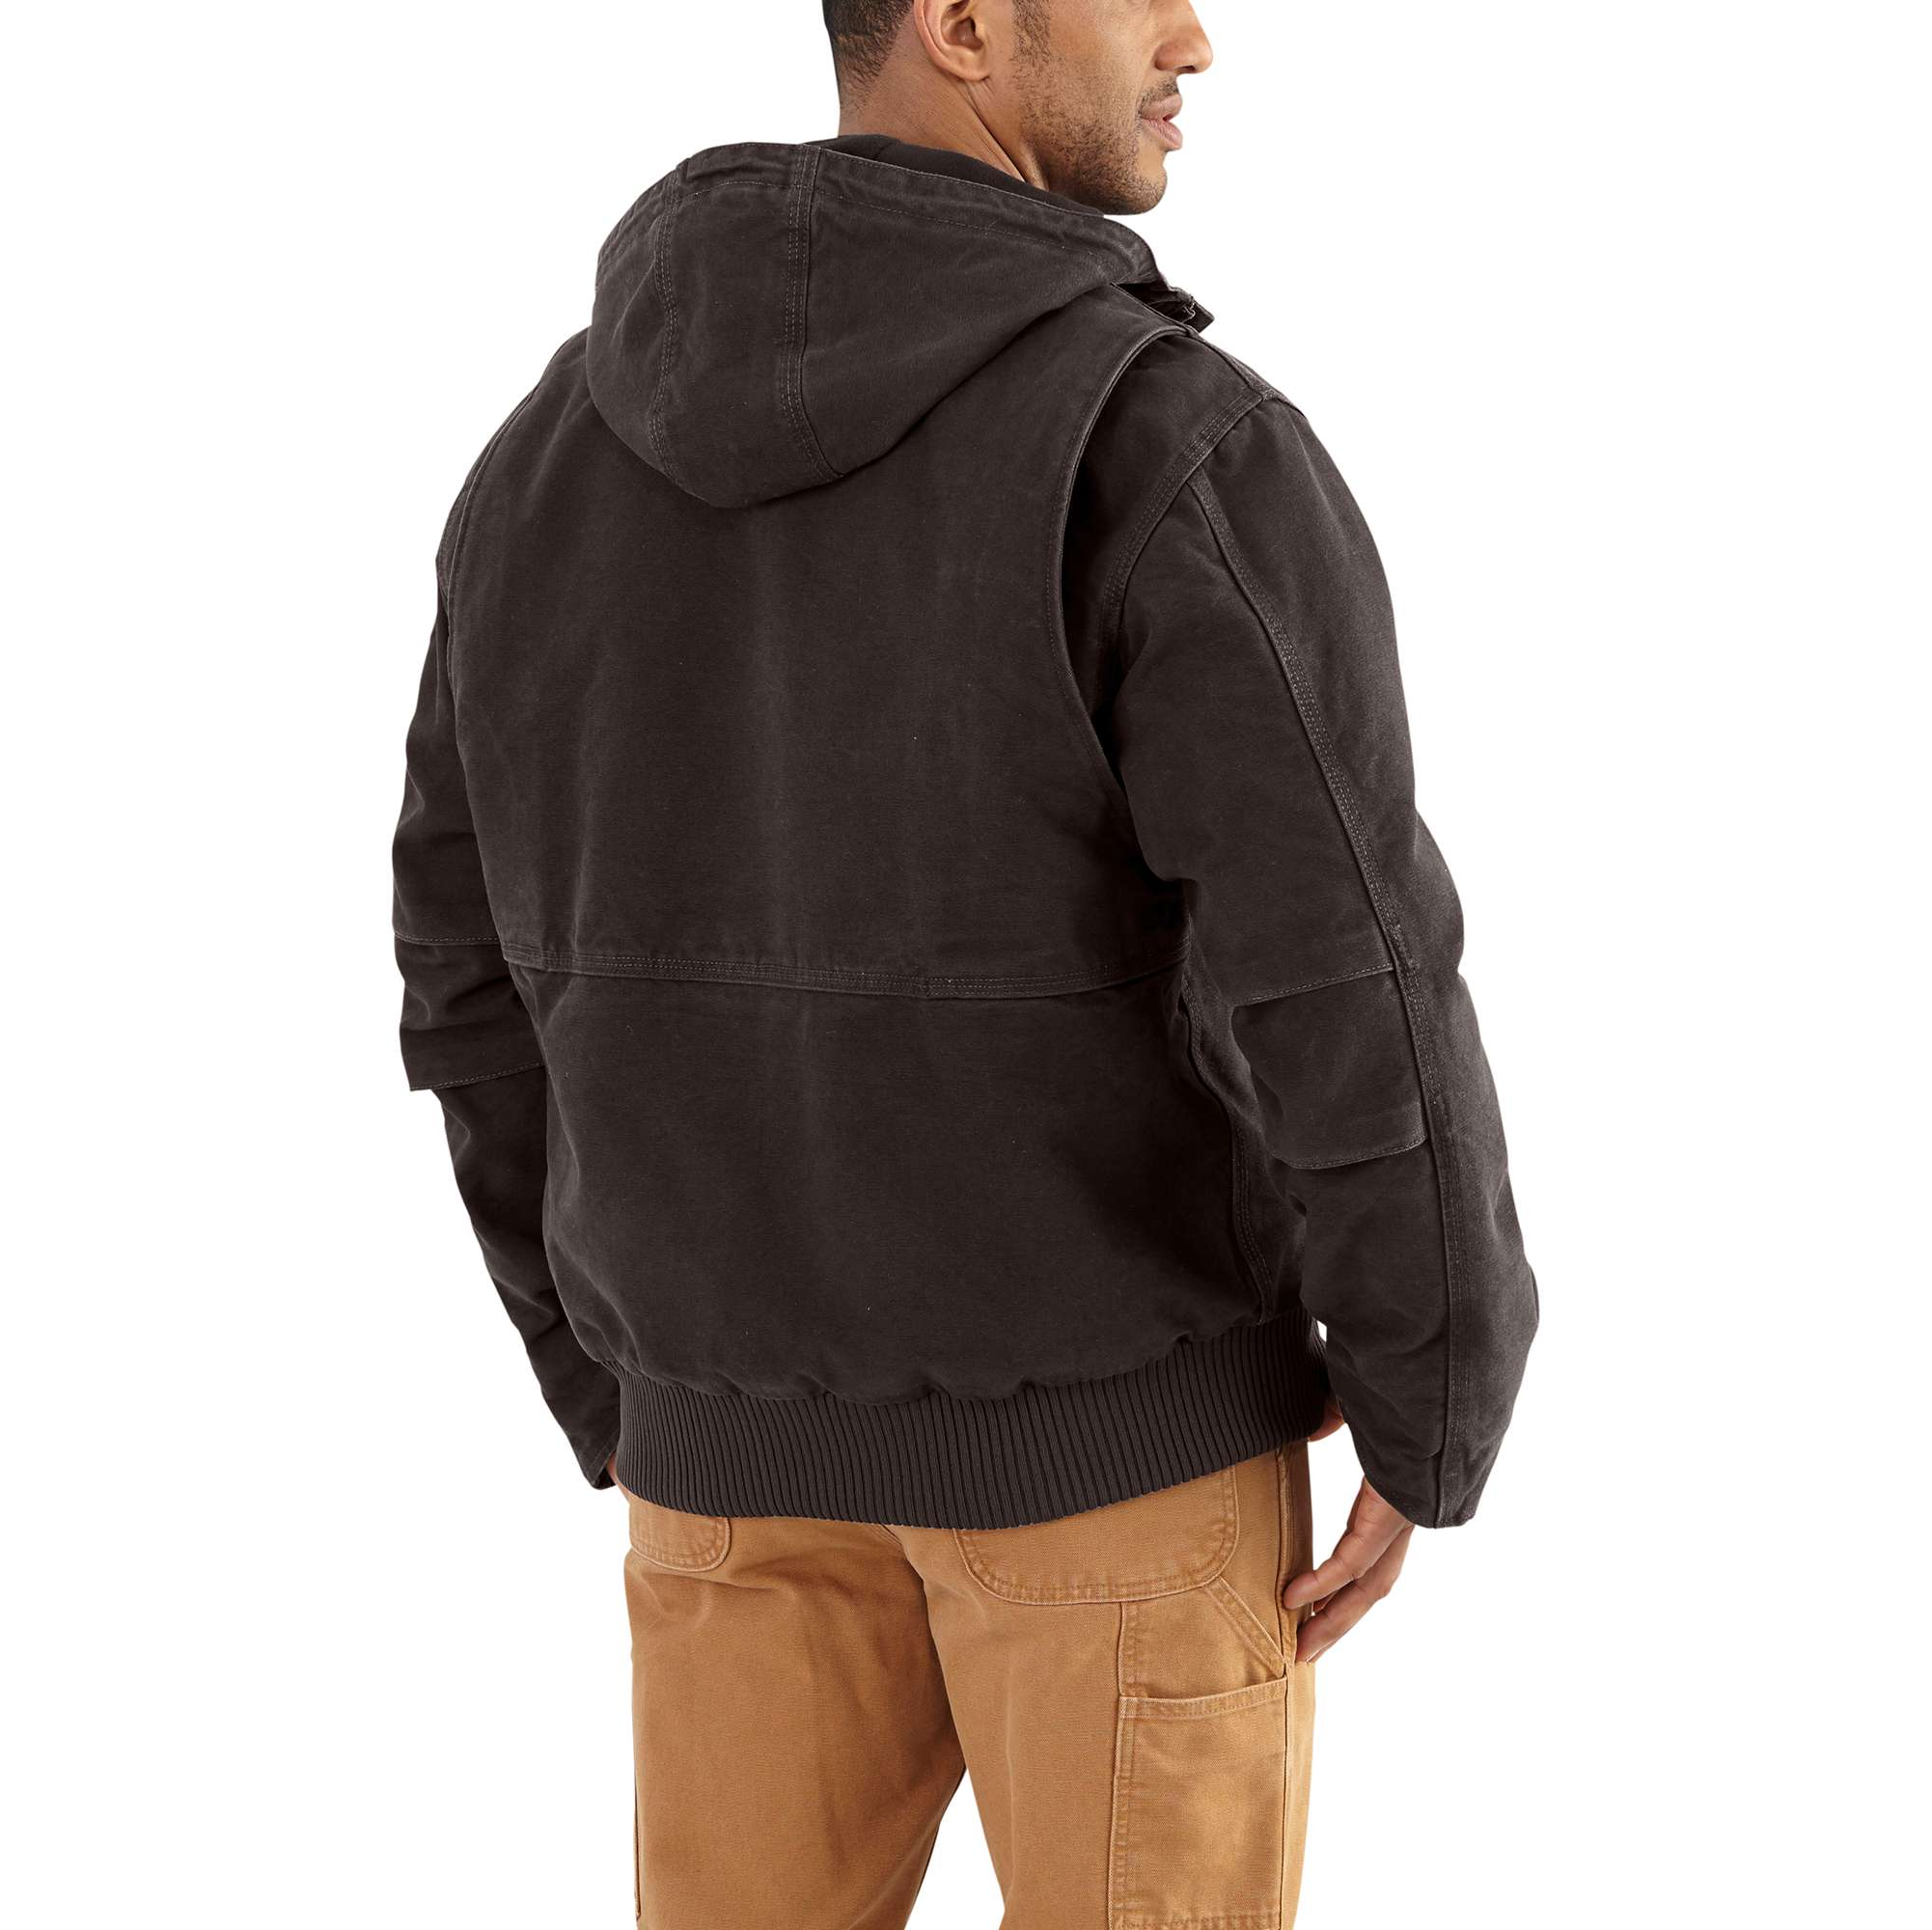 Womens carhartt full swing jacket